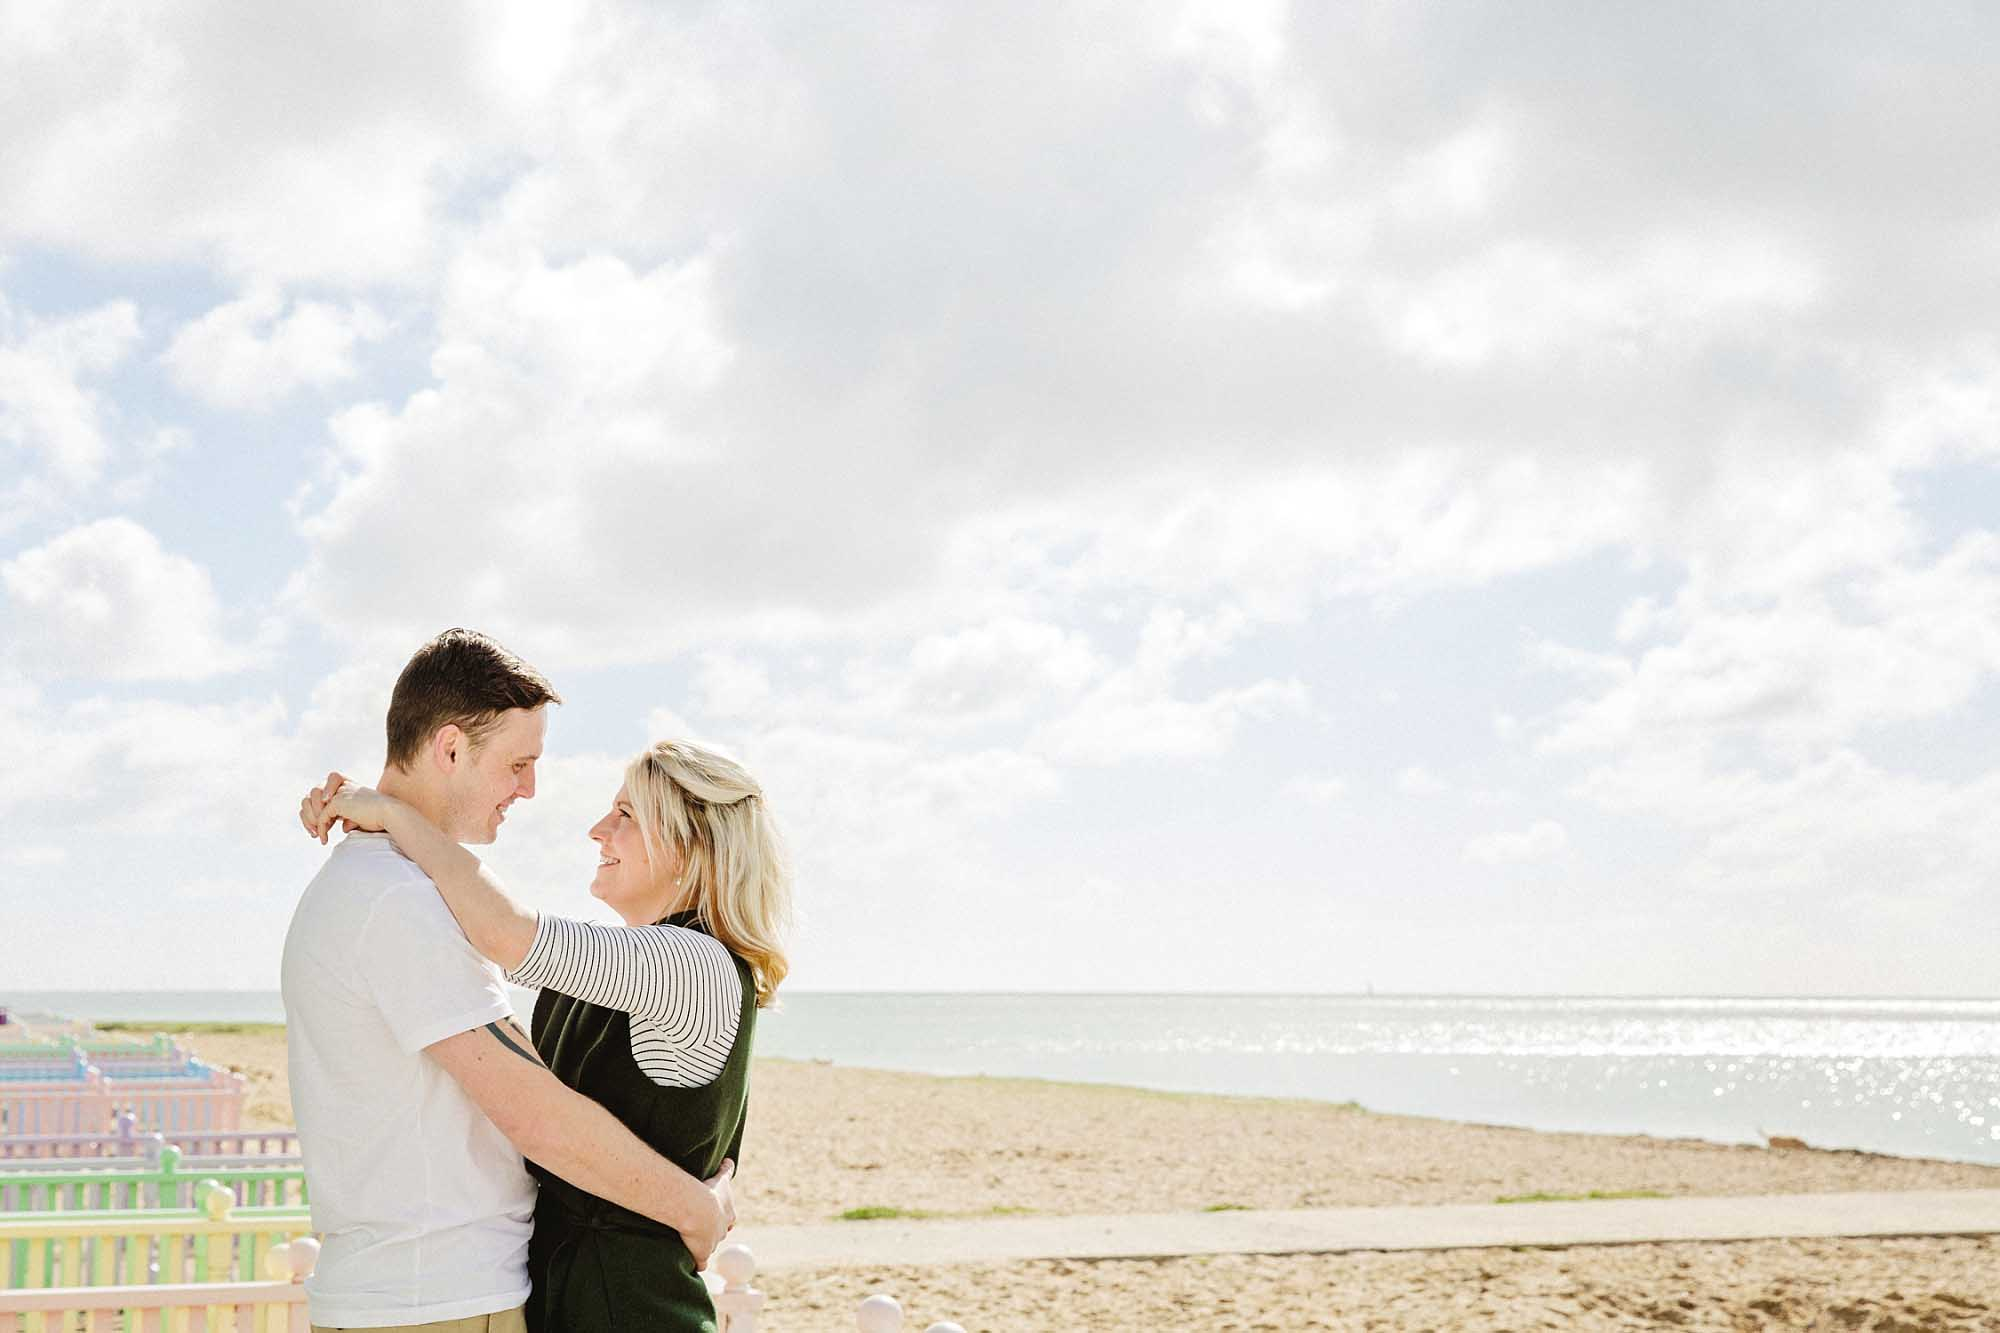 Mersea-Island-Beach-Engagement_0006.jpg